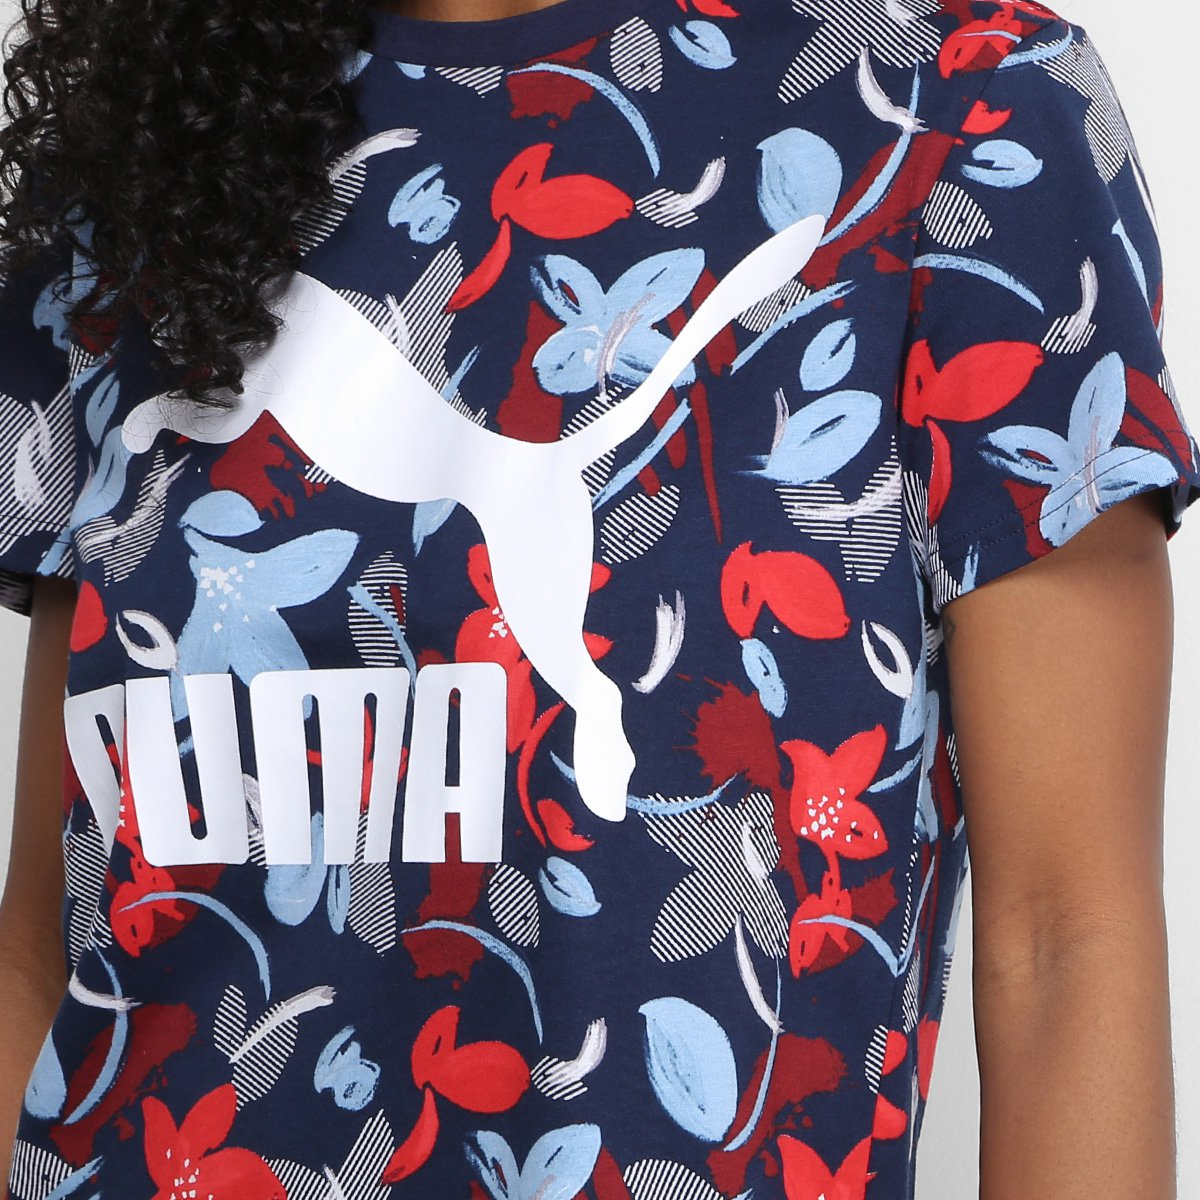 Logo AOP Puma Camiseta Classics Puma Feminina Camiseta Marinho qwfgxTTUaC